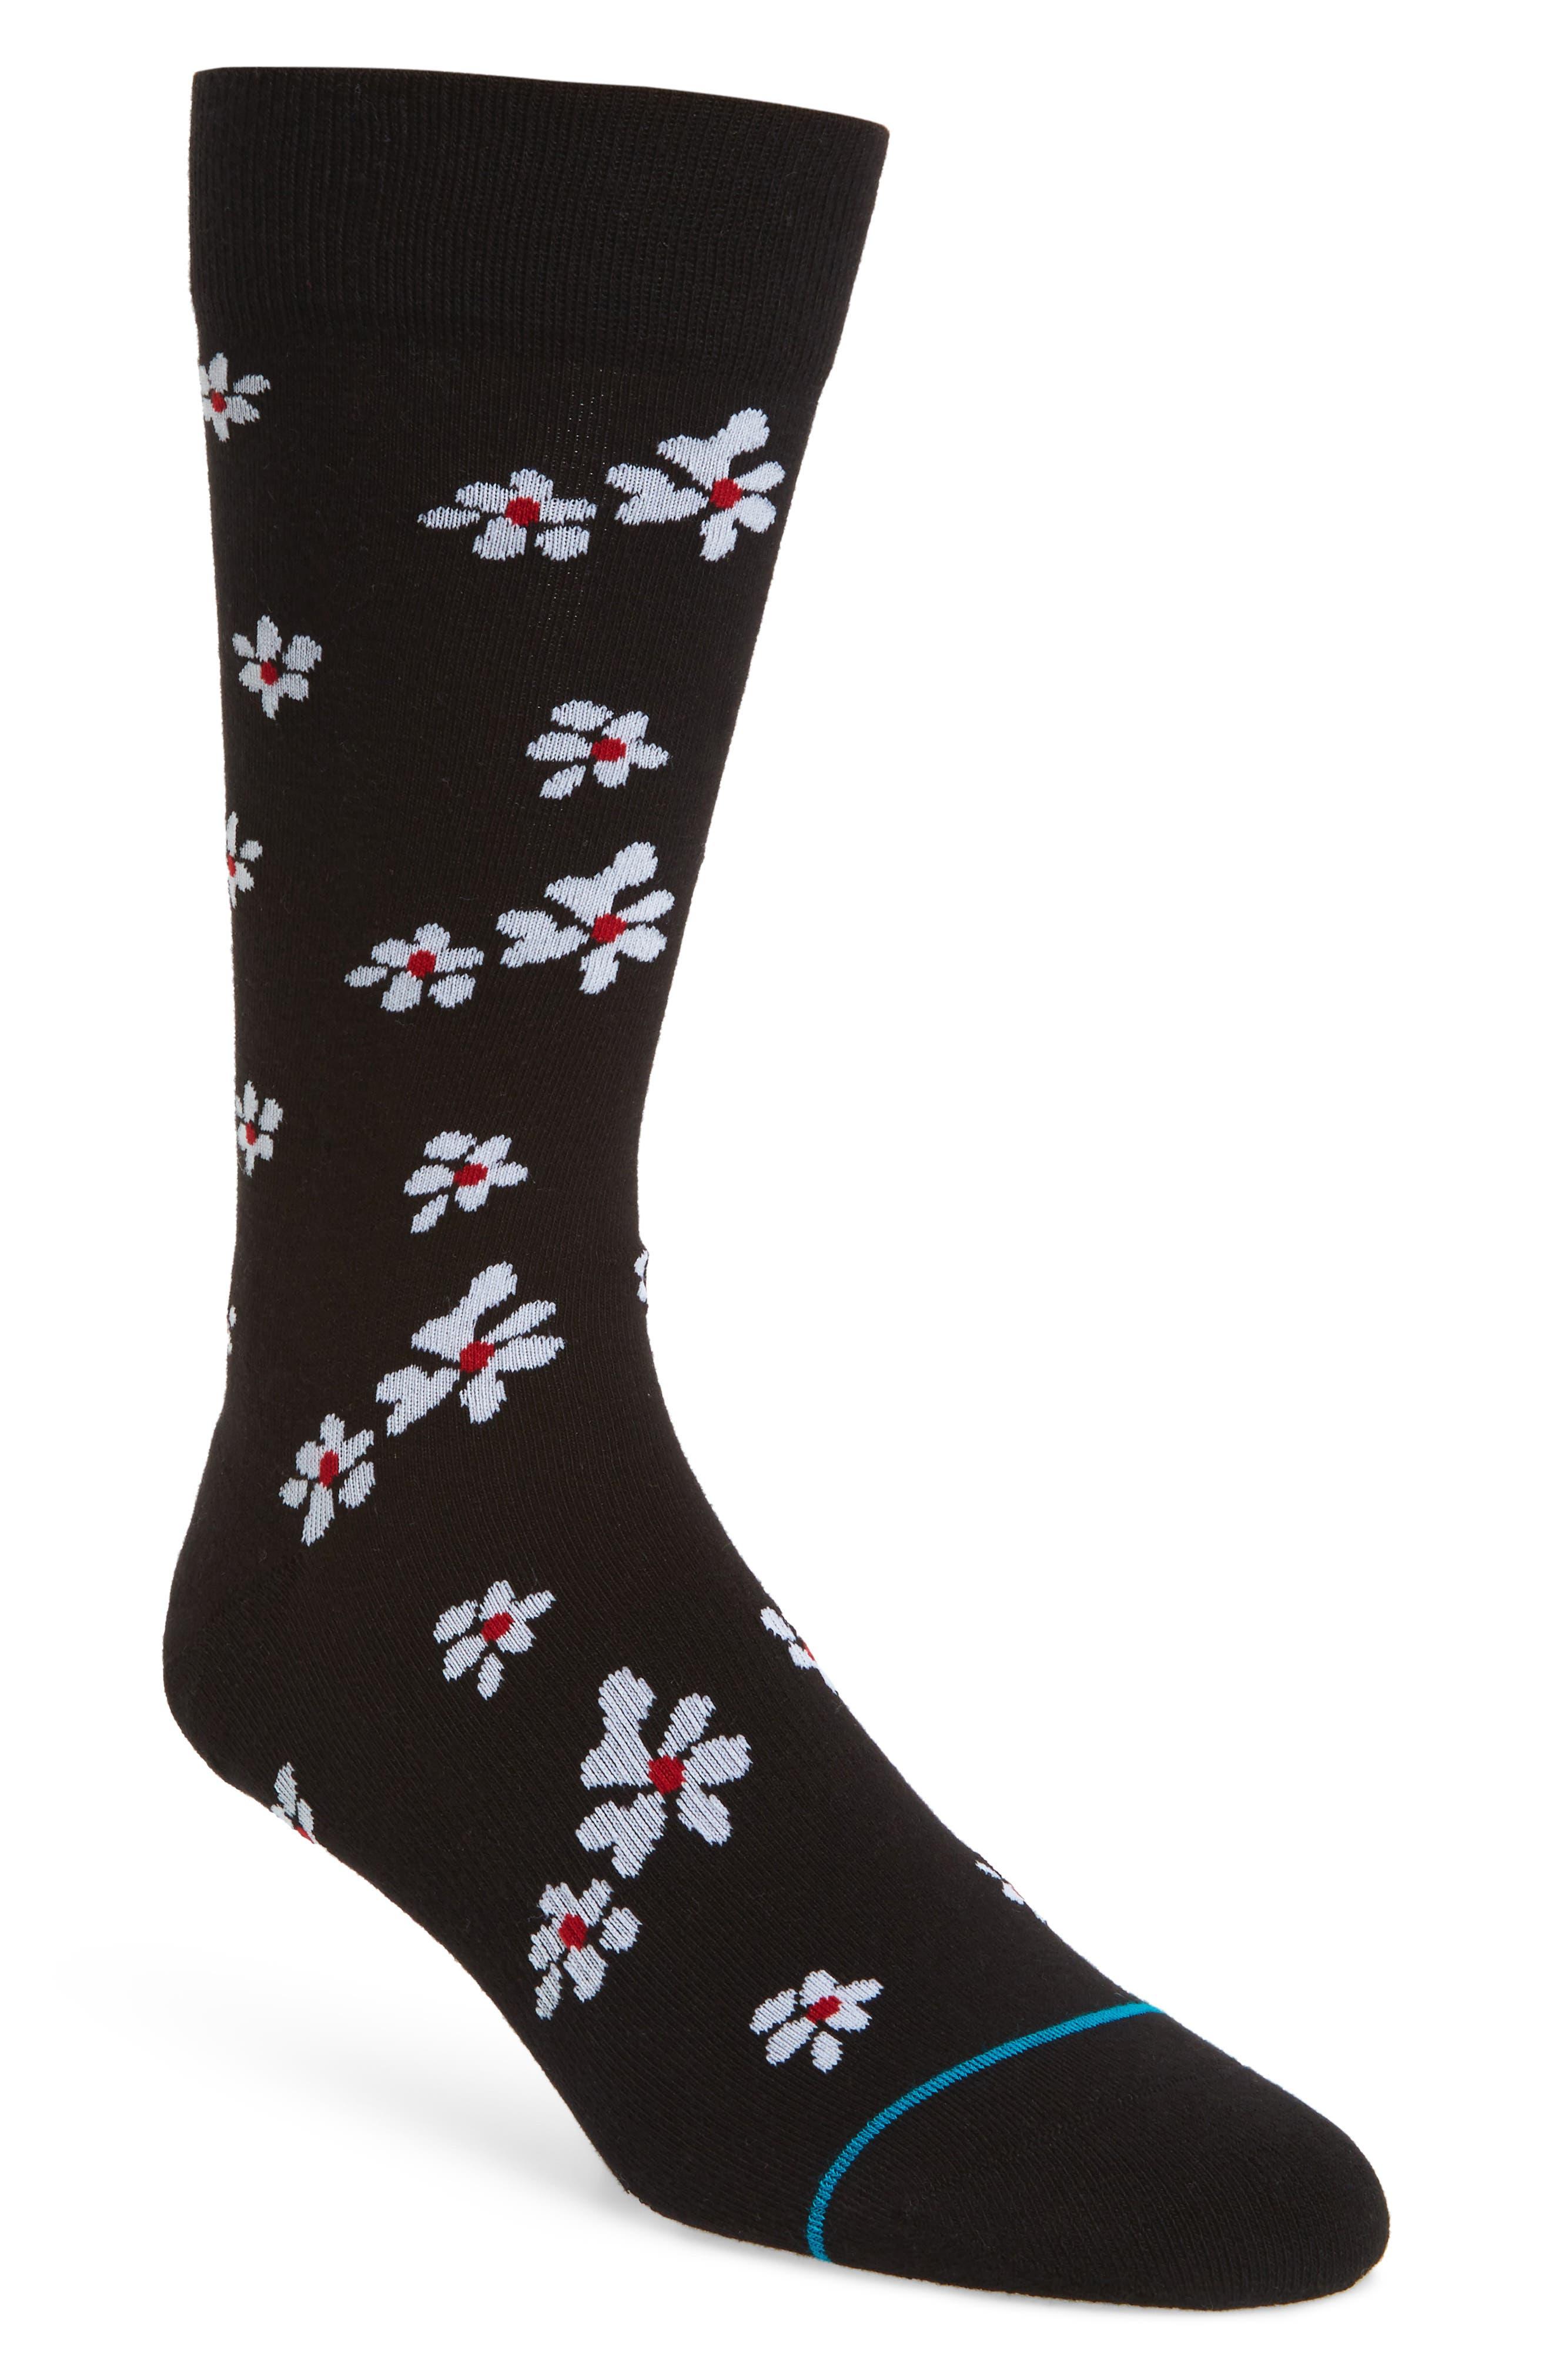 Hendriksen Crew Socks,                             Main thumbnail 1, color,                             Black